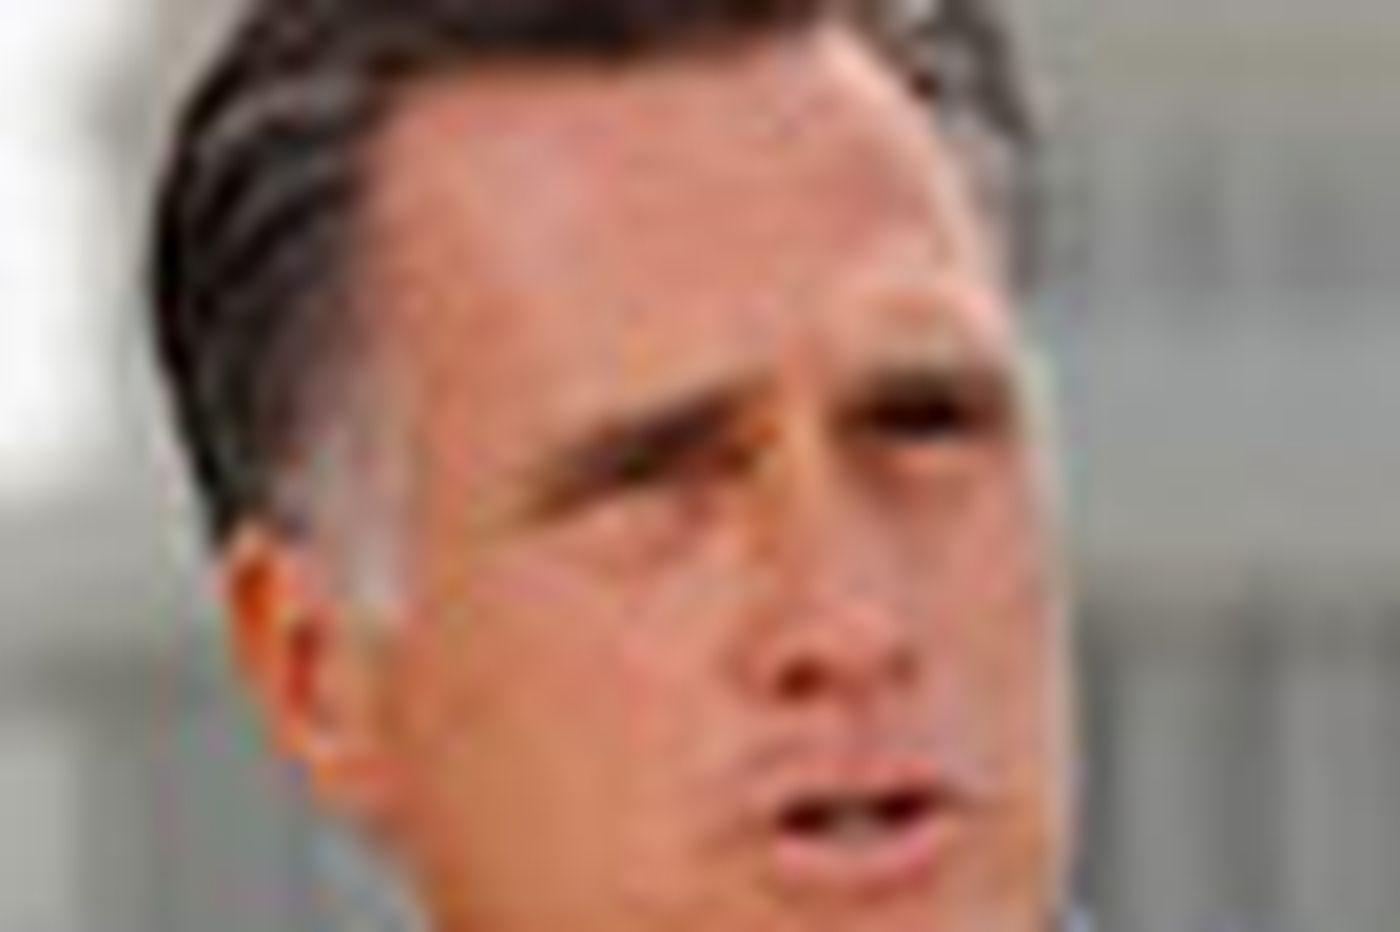 Romney should reassure alienated U.S. allies